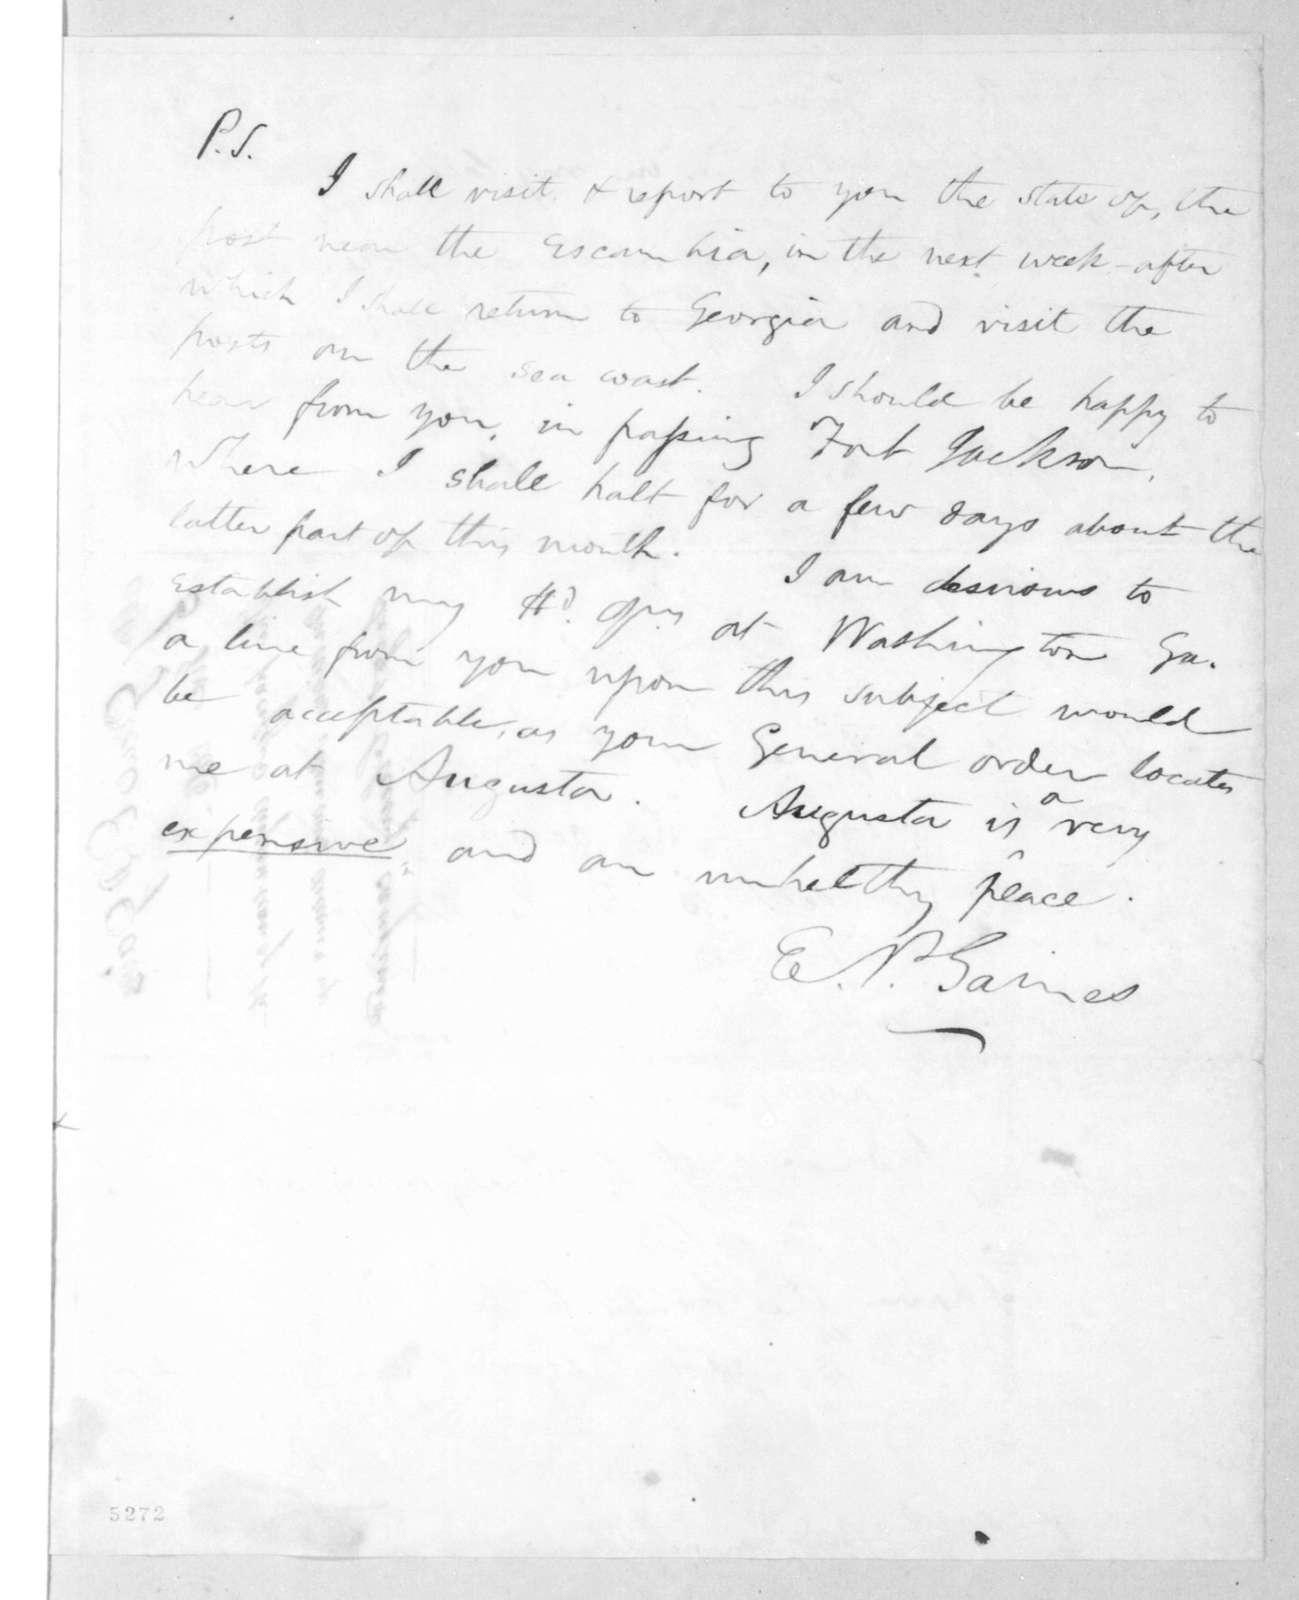 Edmund Pendleton Gaines to Andrew Jackson, June 3, 1816